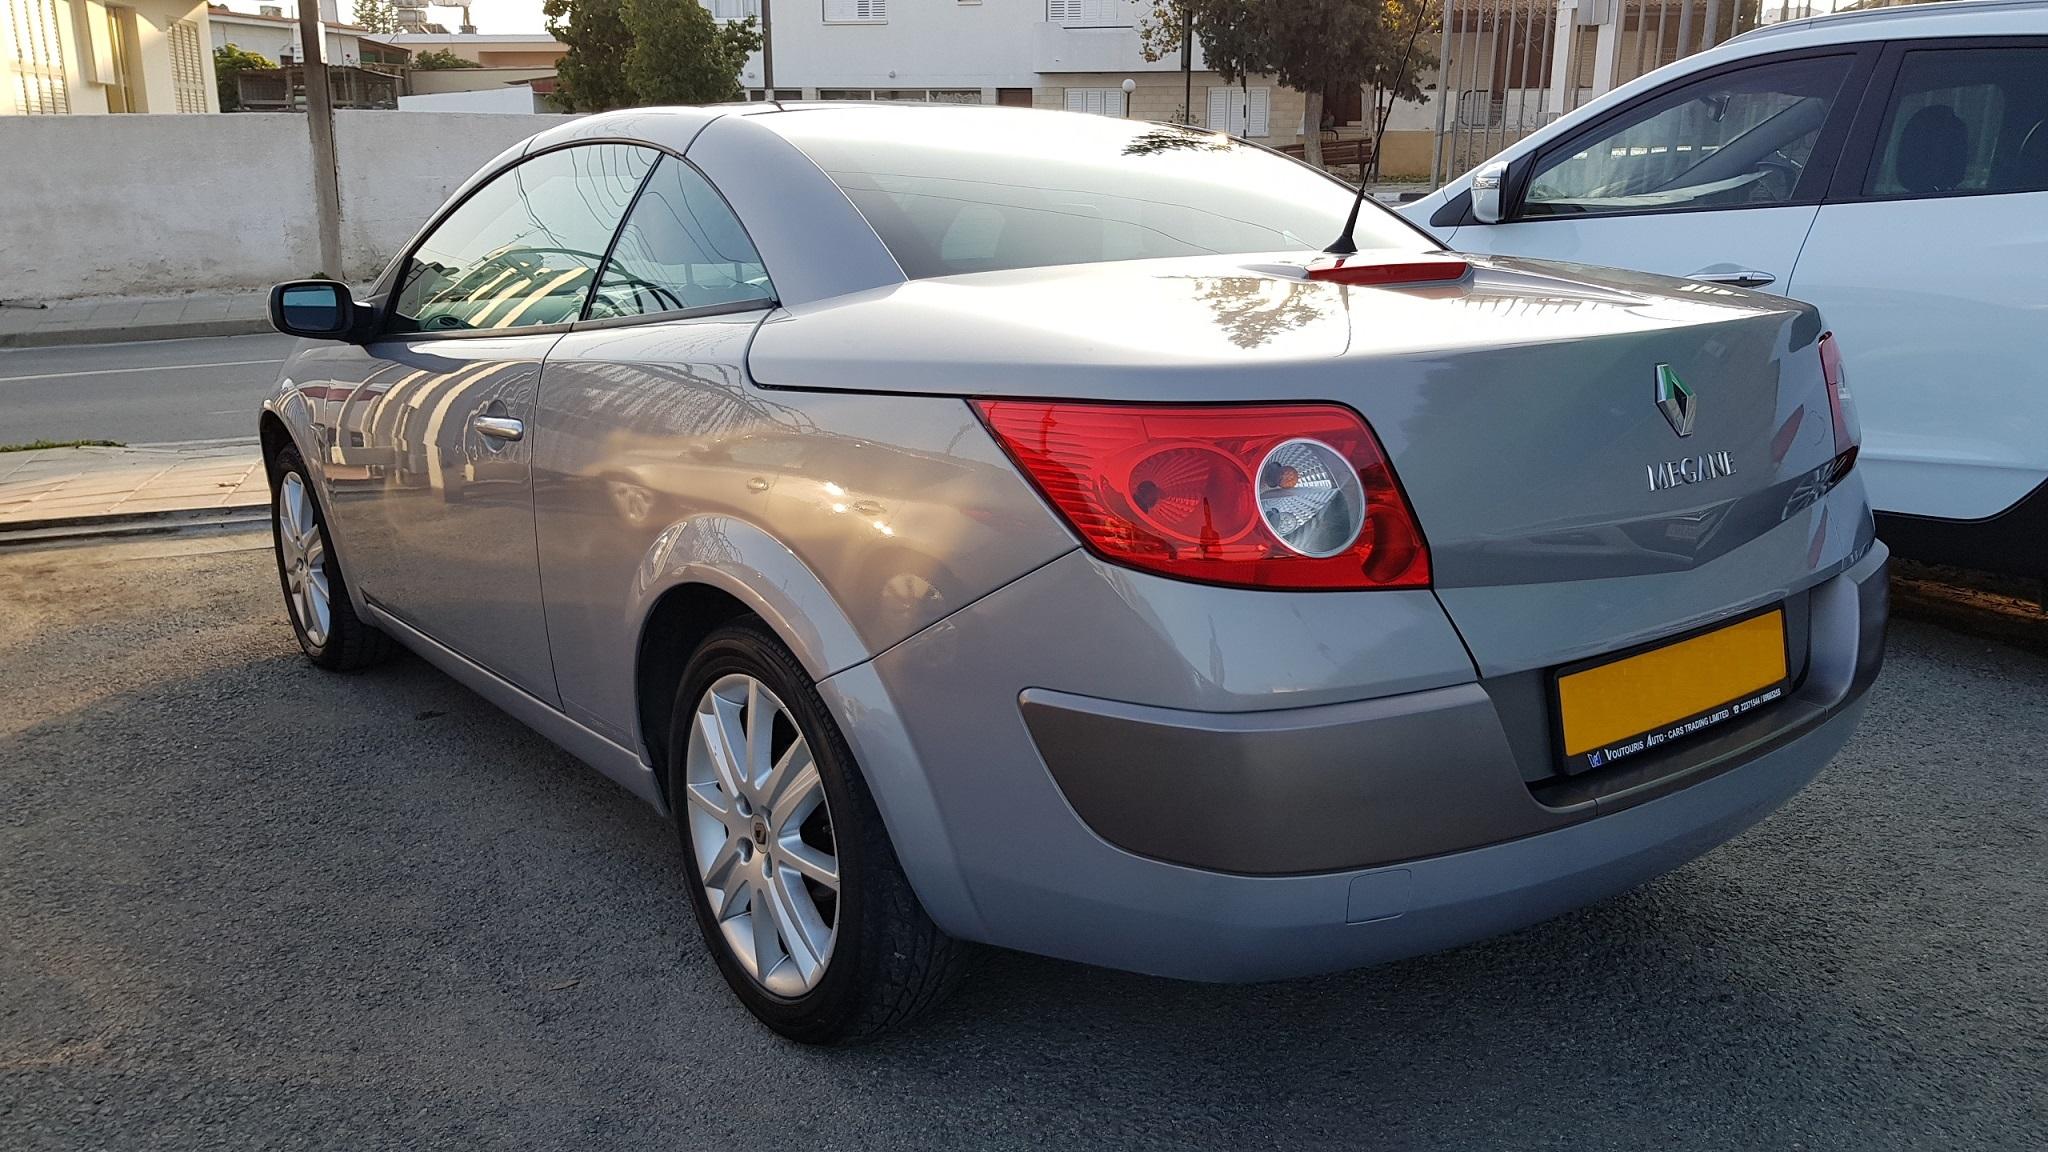 Renault Megane Convertible 05